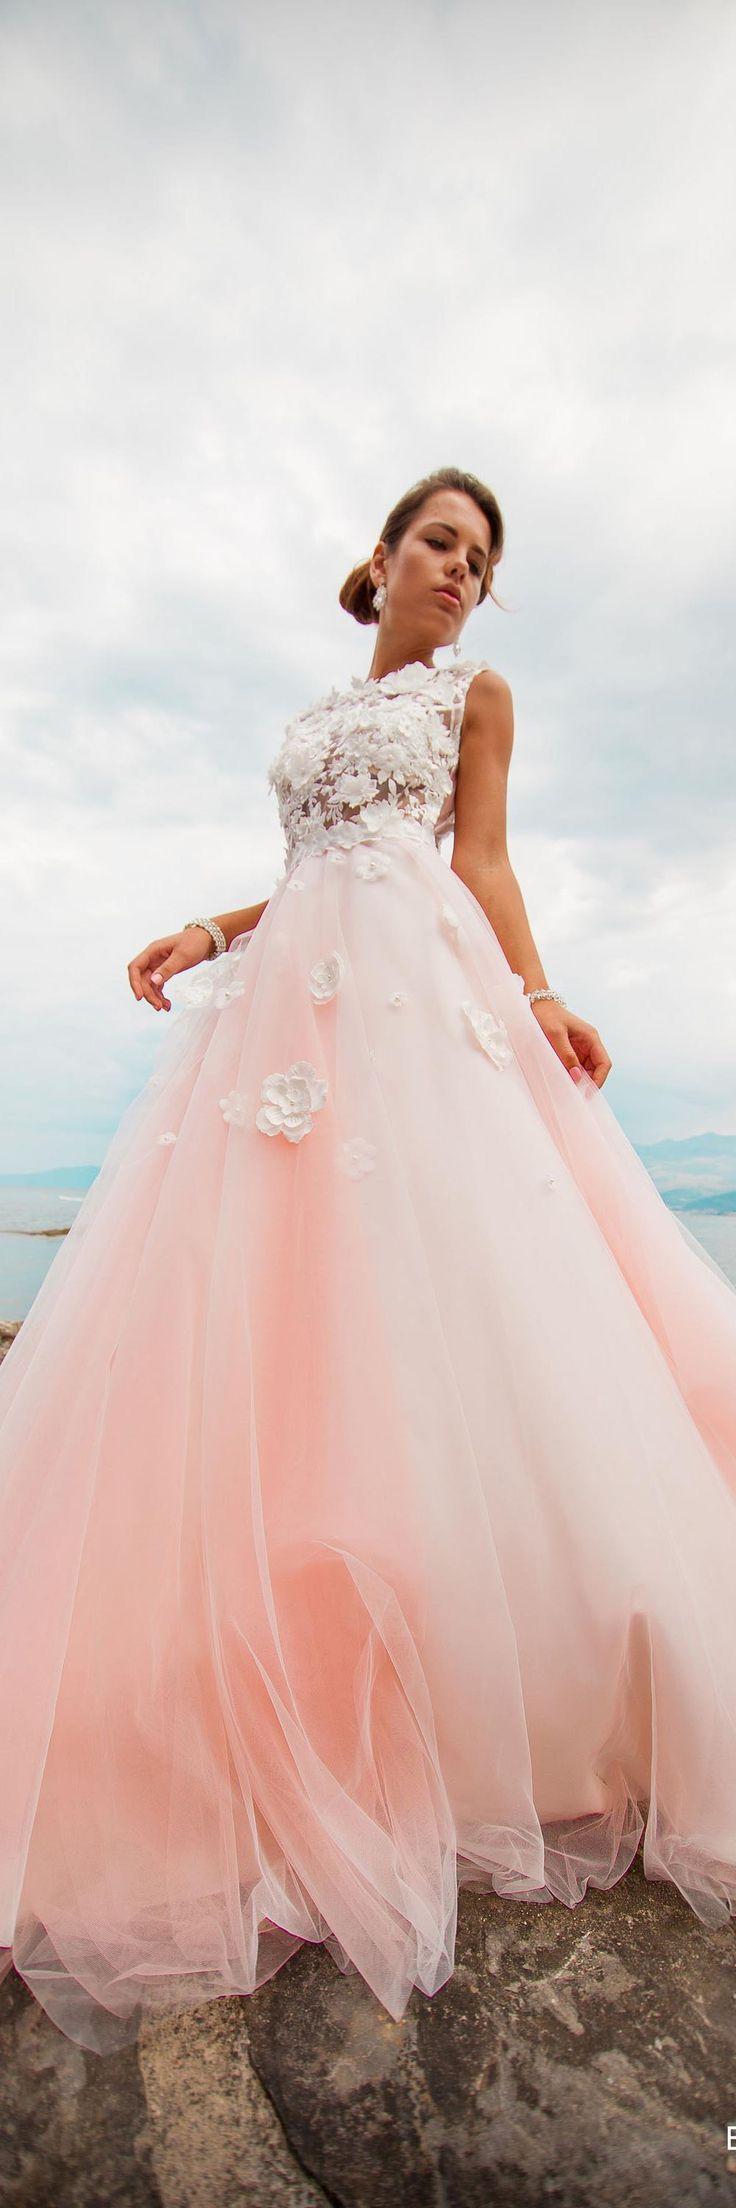 15 best Mermaid wedding dress lace images on Pinterest